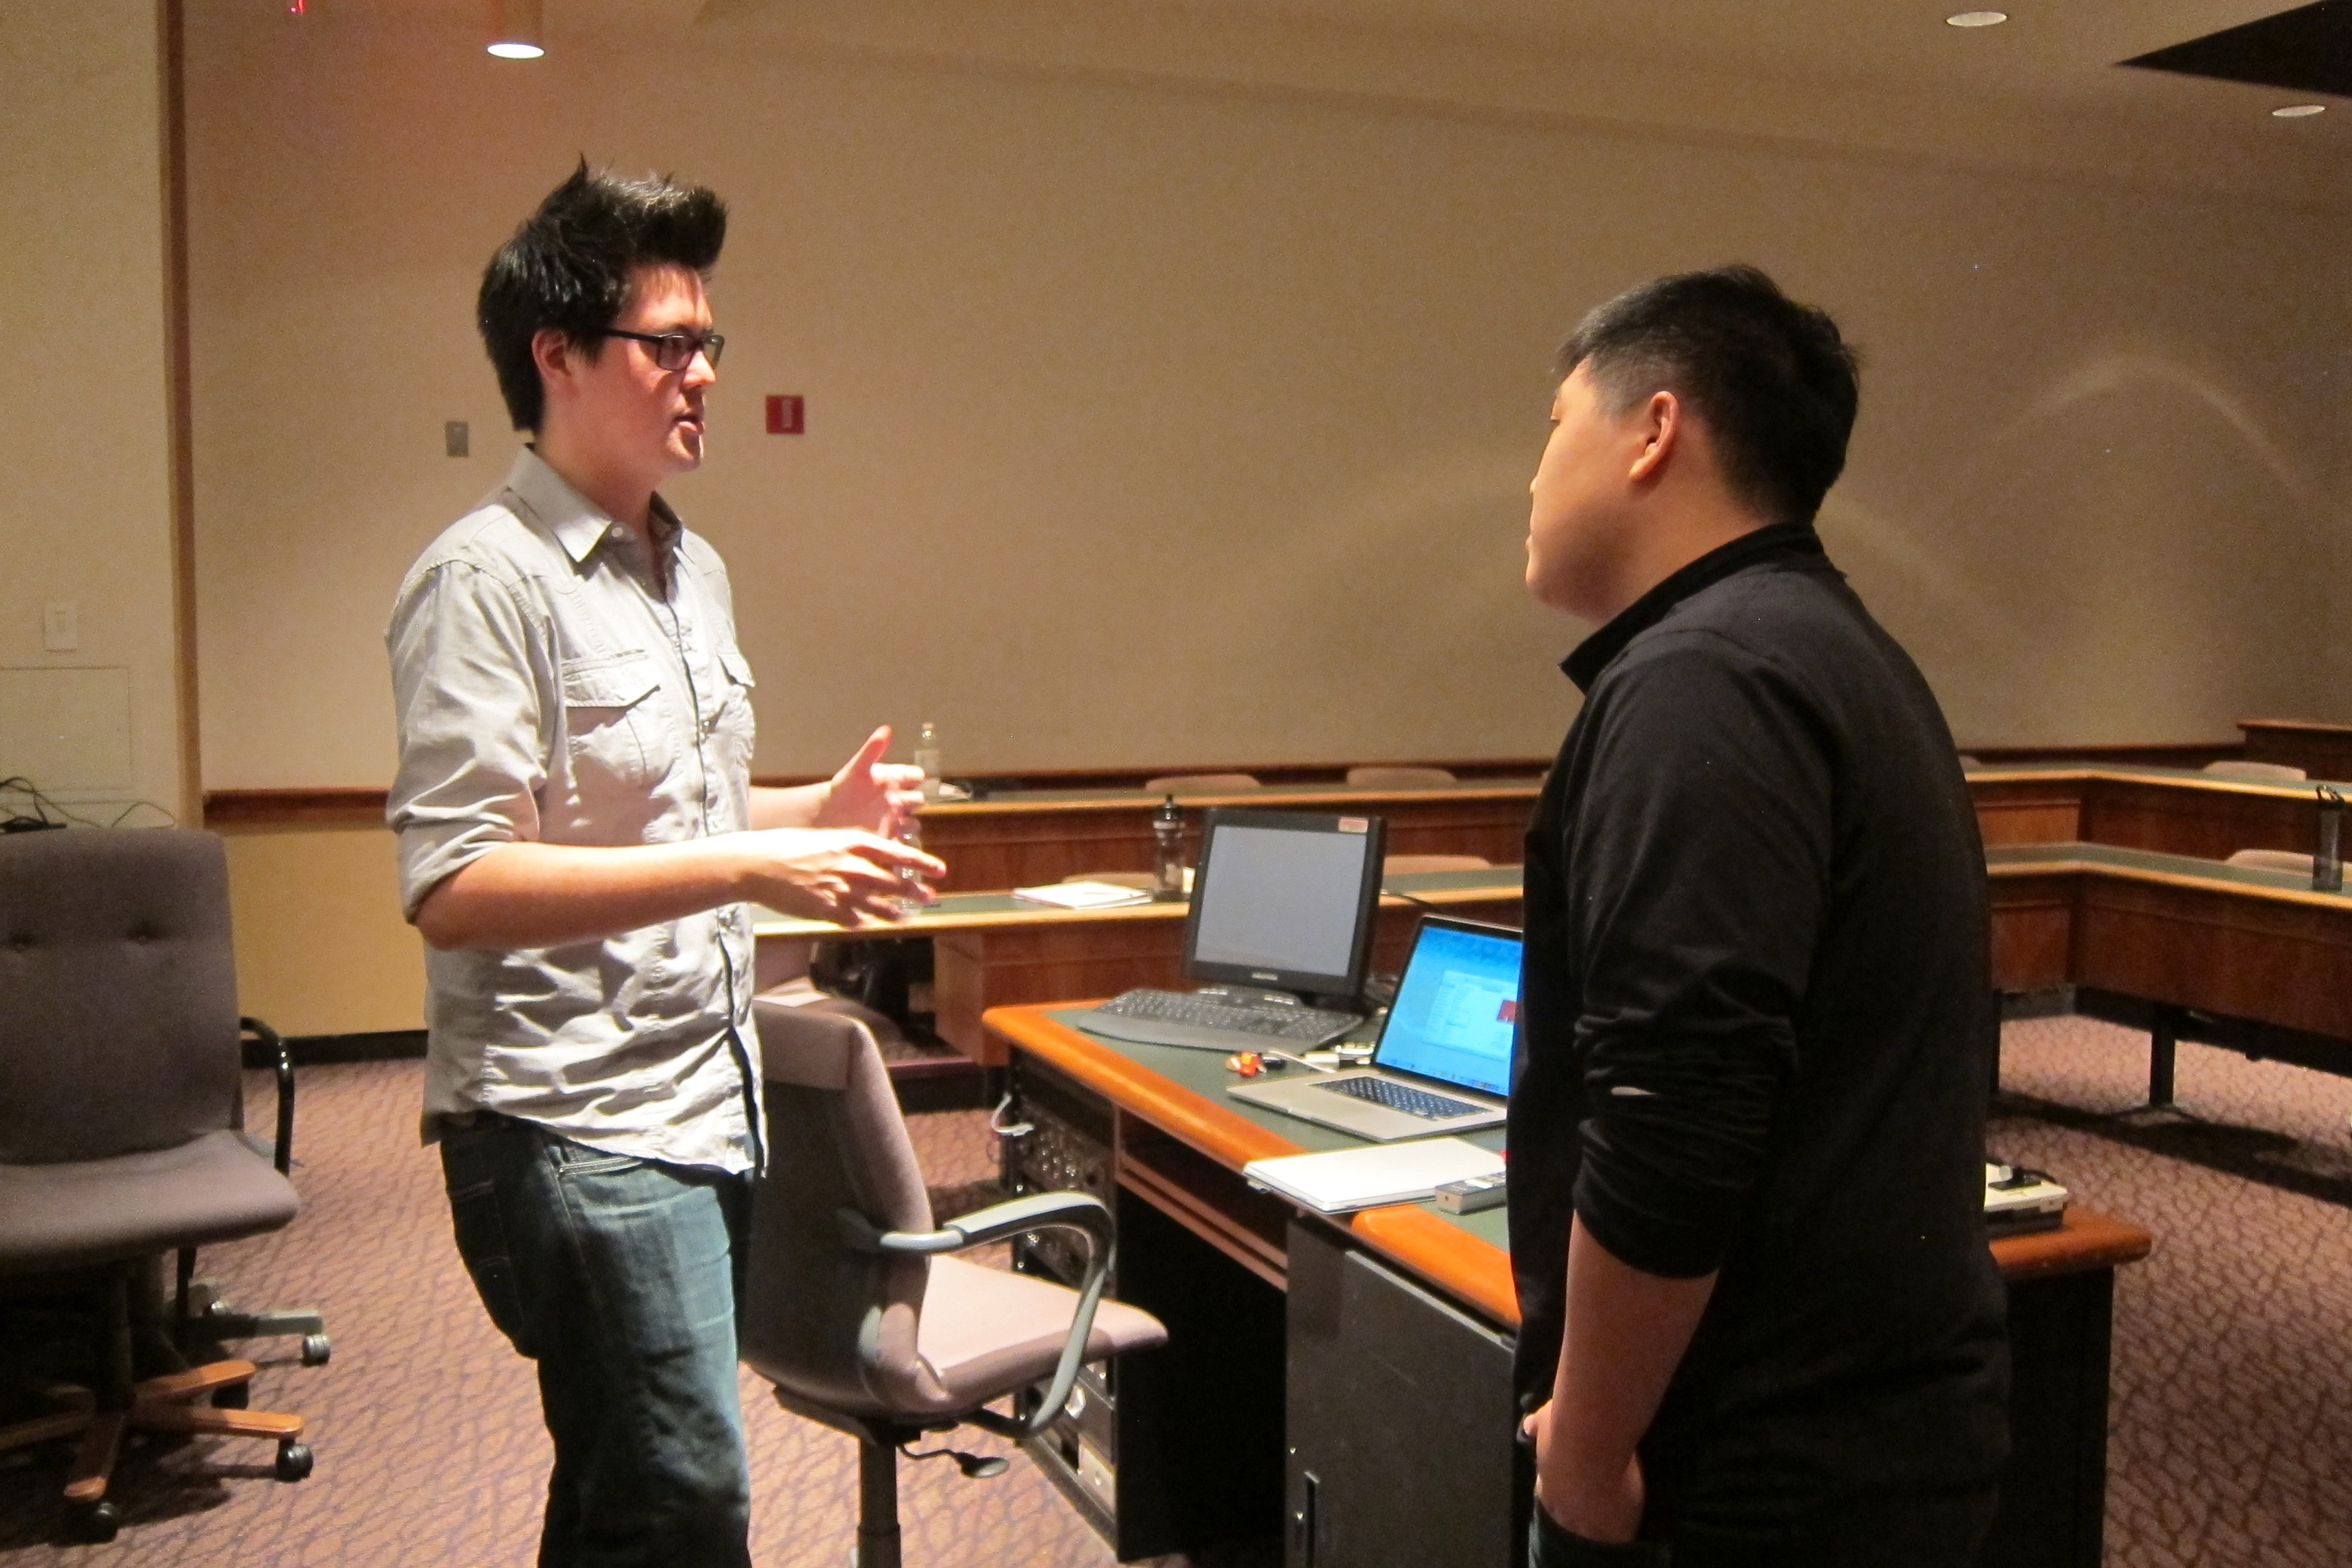 Jordan DeVries talking to Chunwoo Baik